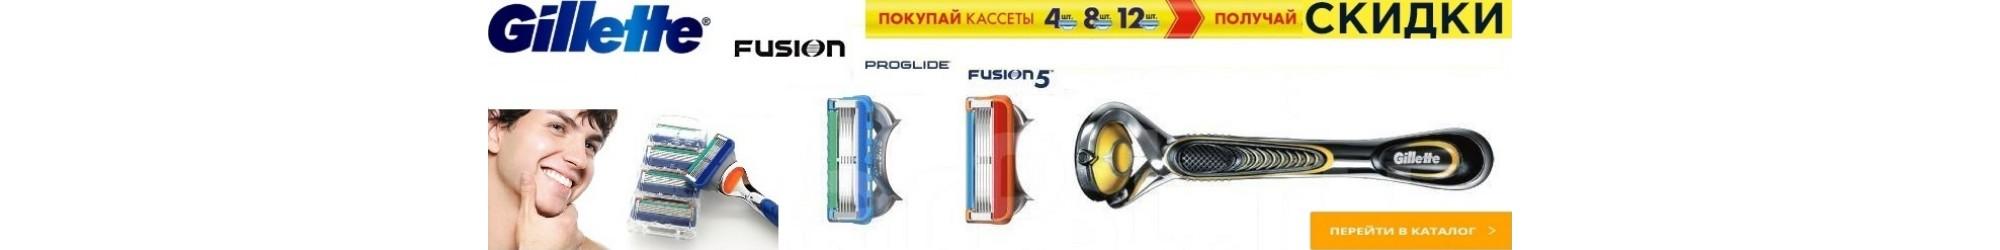 Gillette Fusion Power оптом